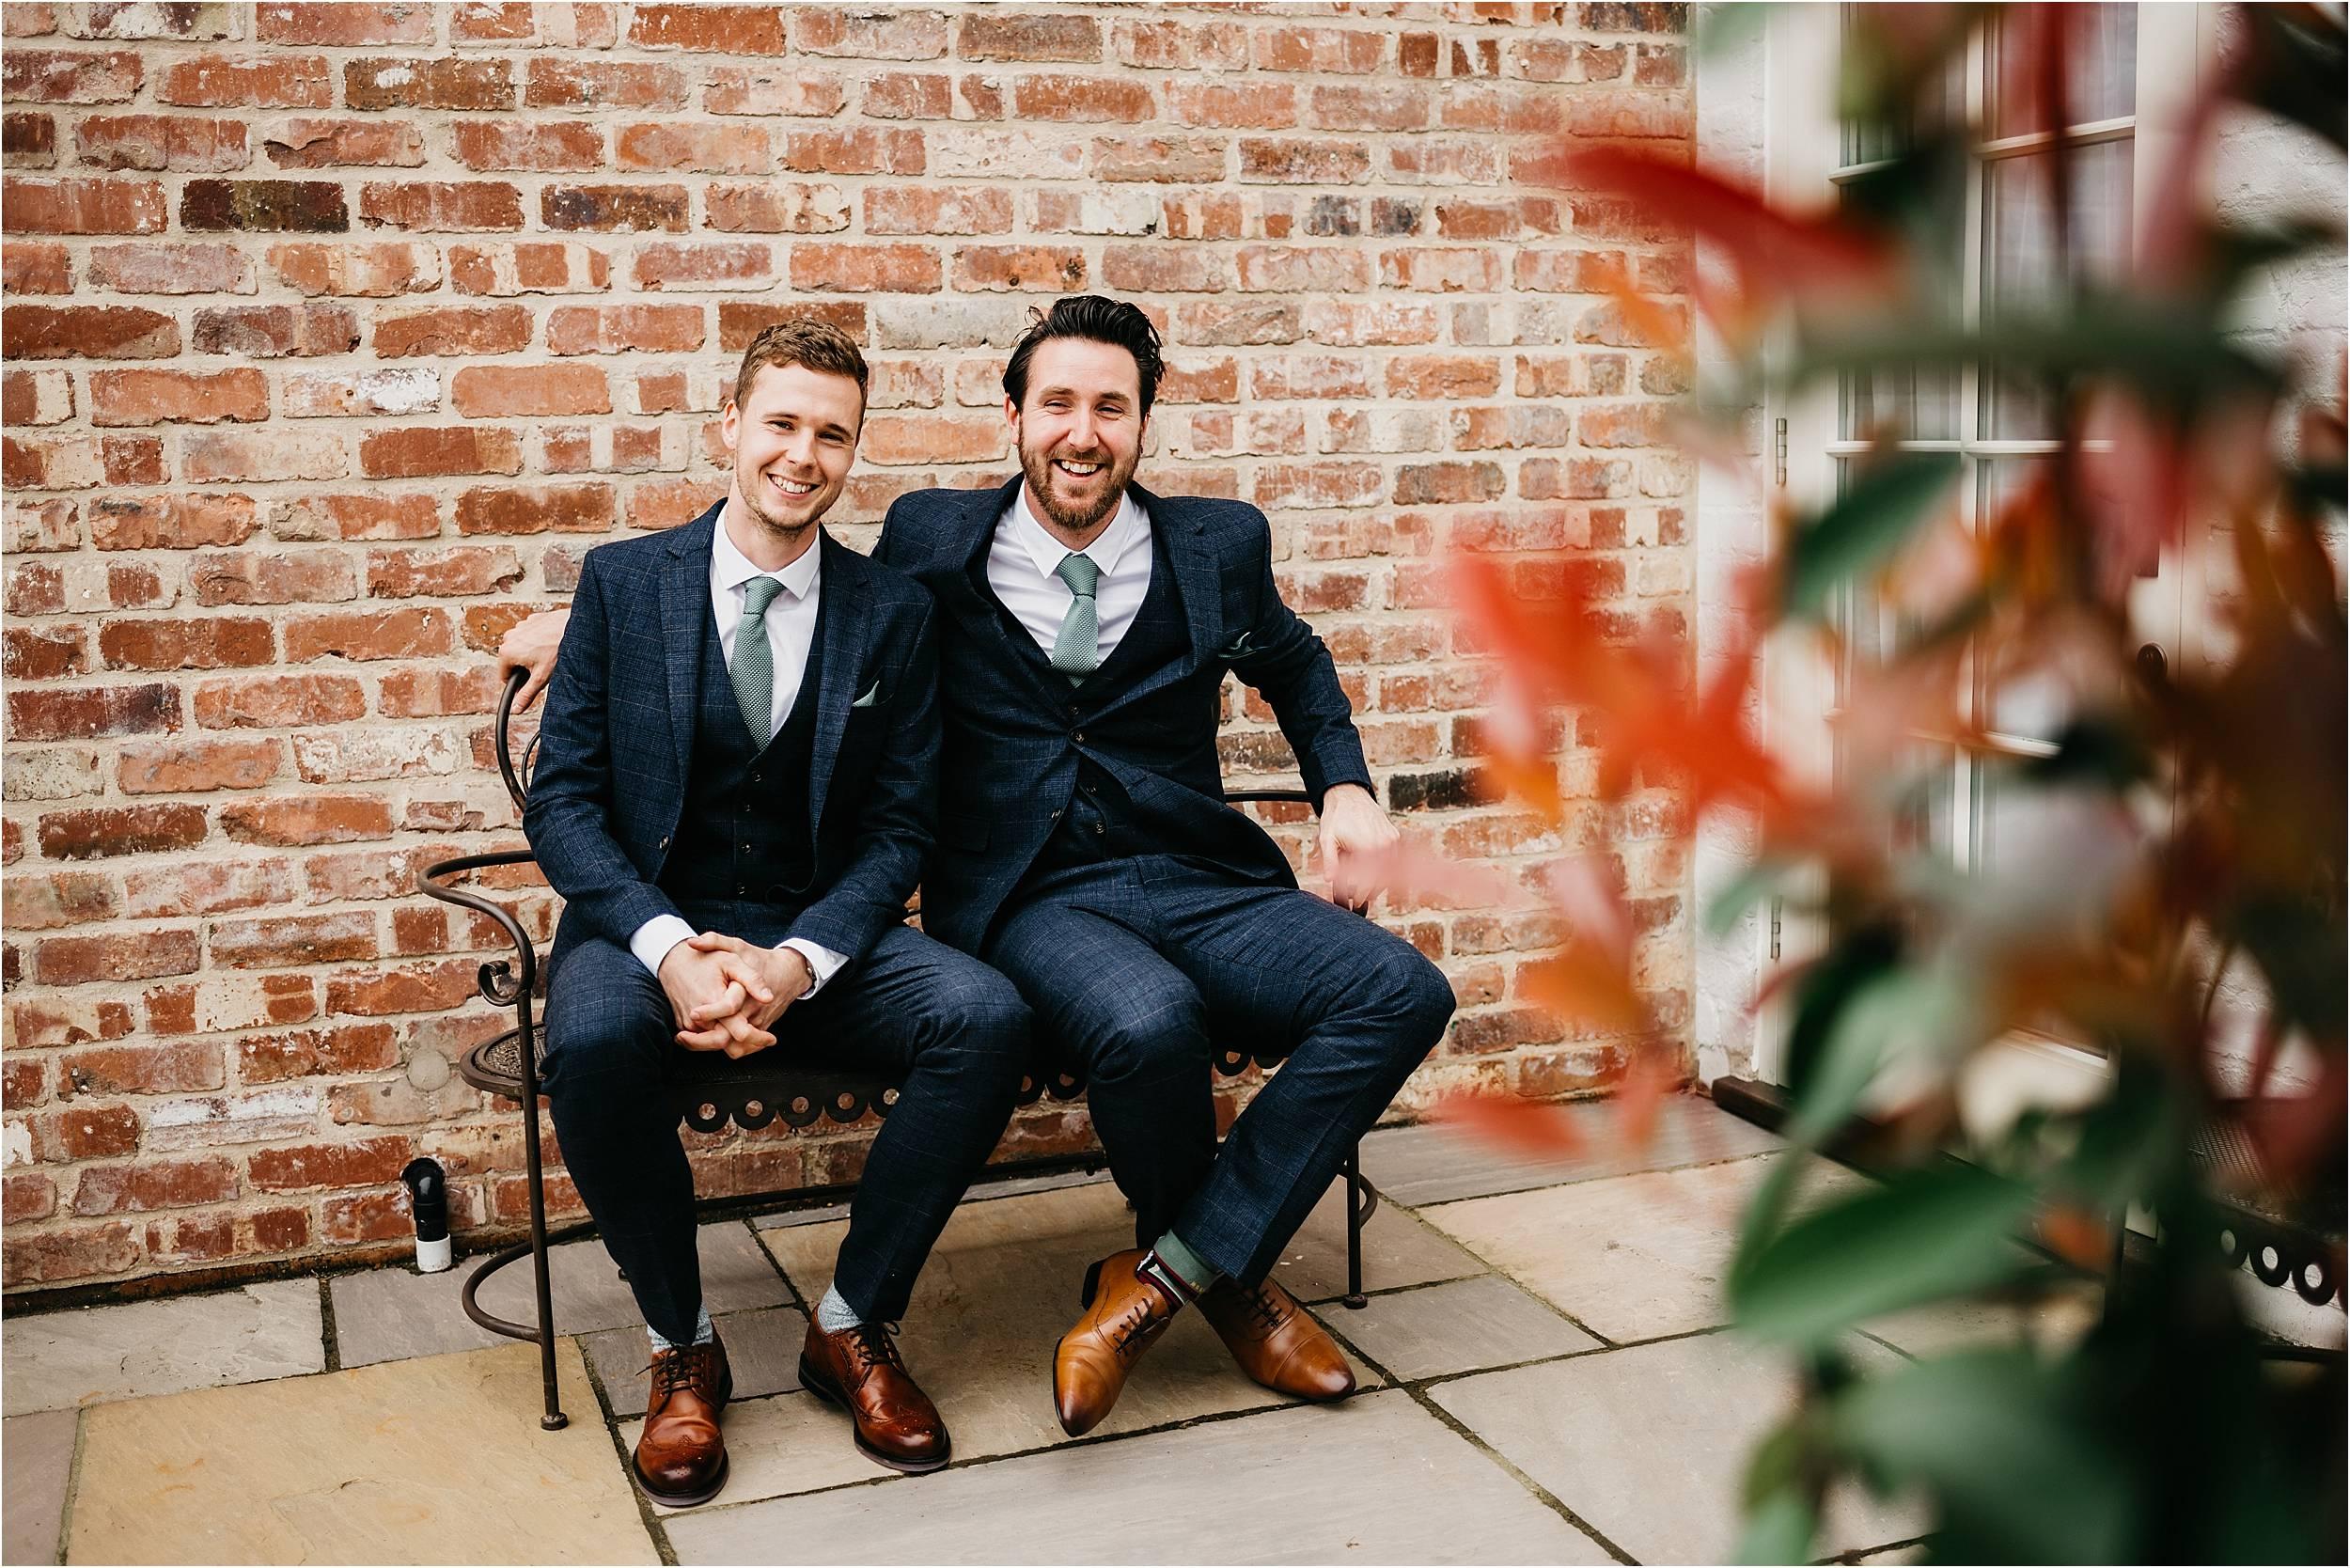 Kedleston Country House Wedding Photography_0010.jpg